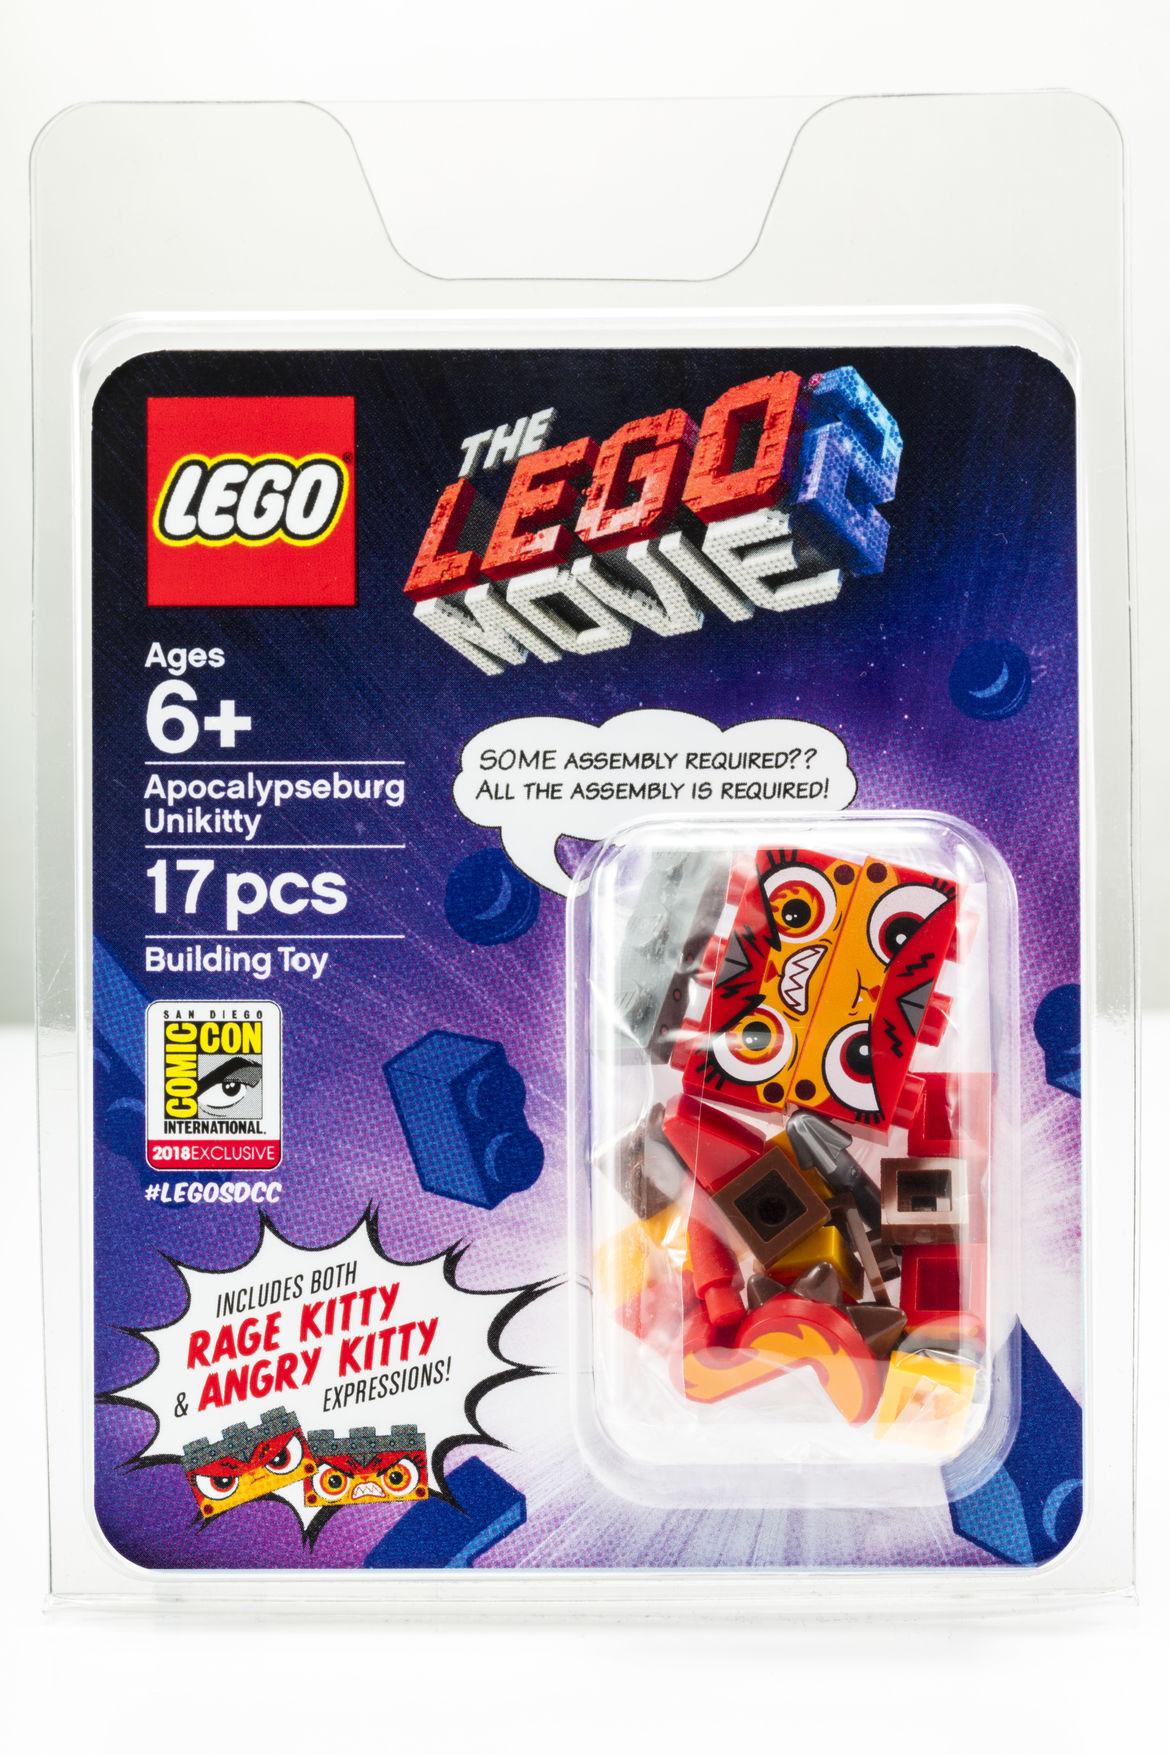 LEGO_SDCC_2018_Apocalypseburg_Unikitty_Packaging